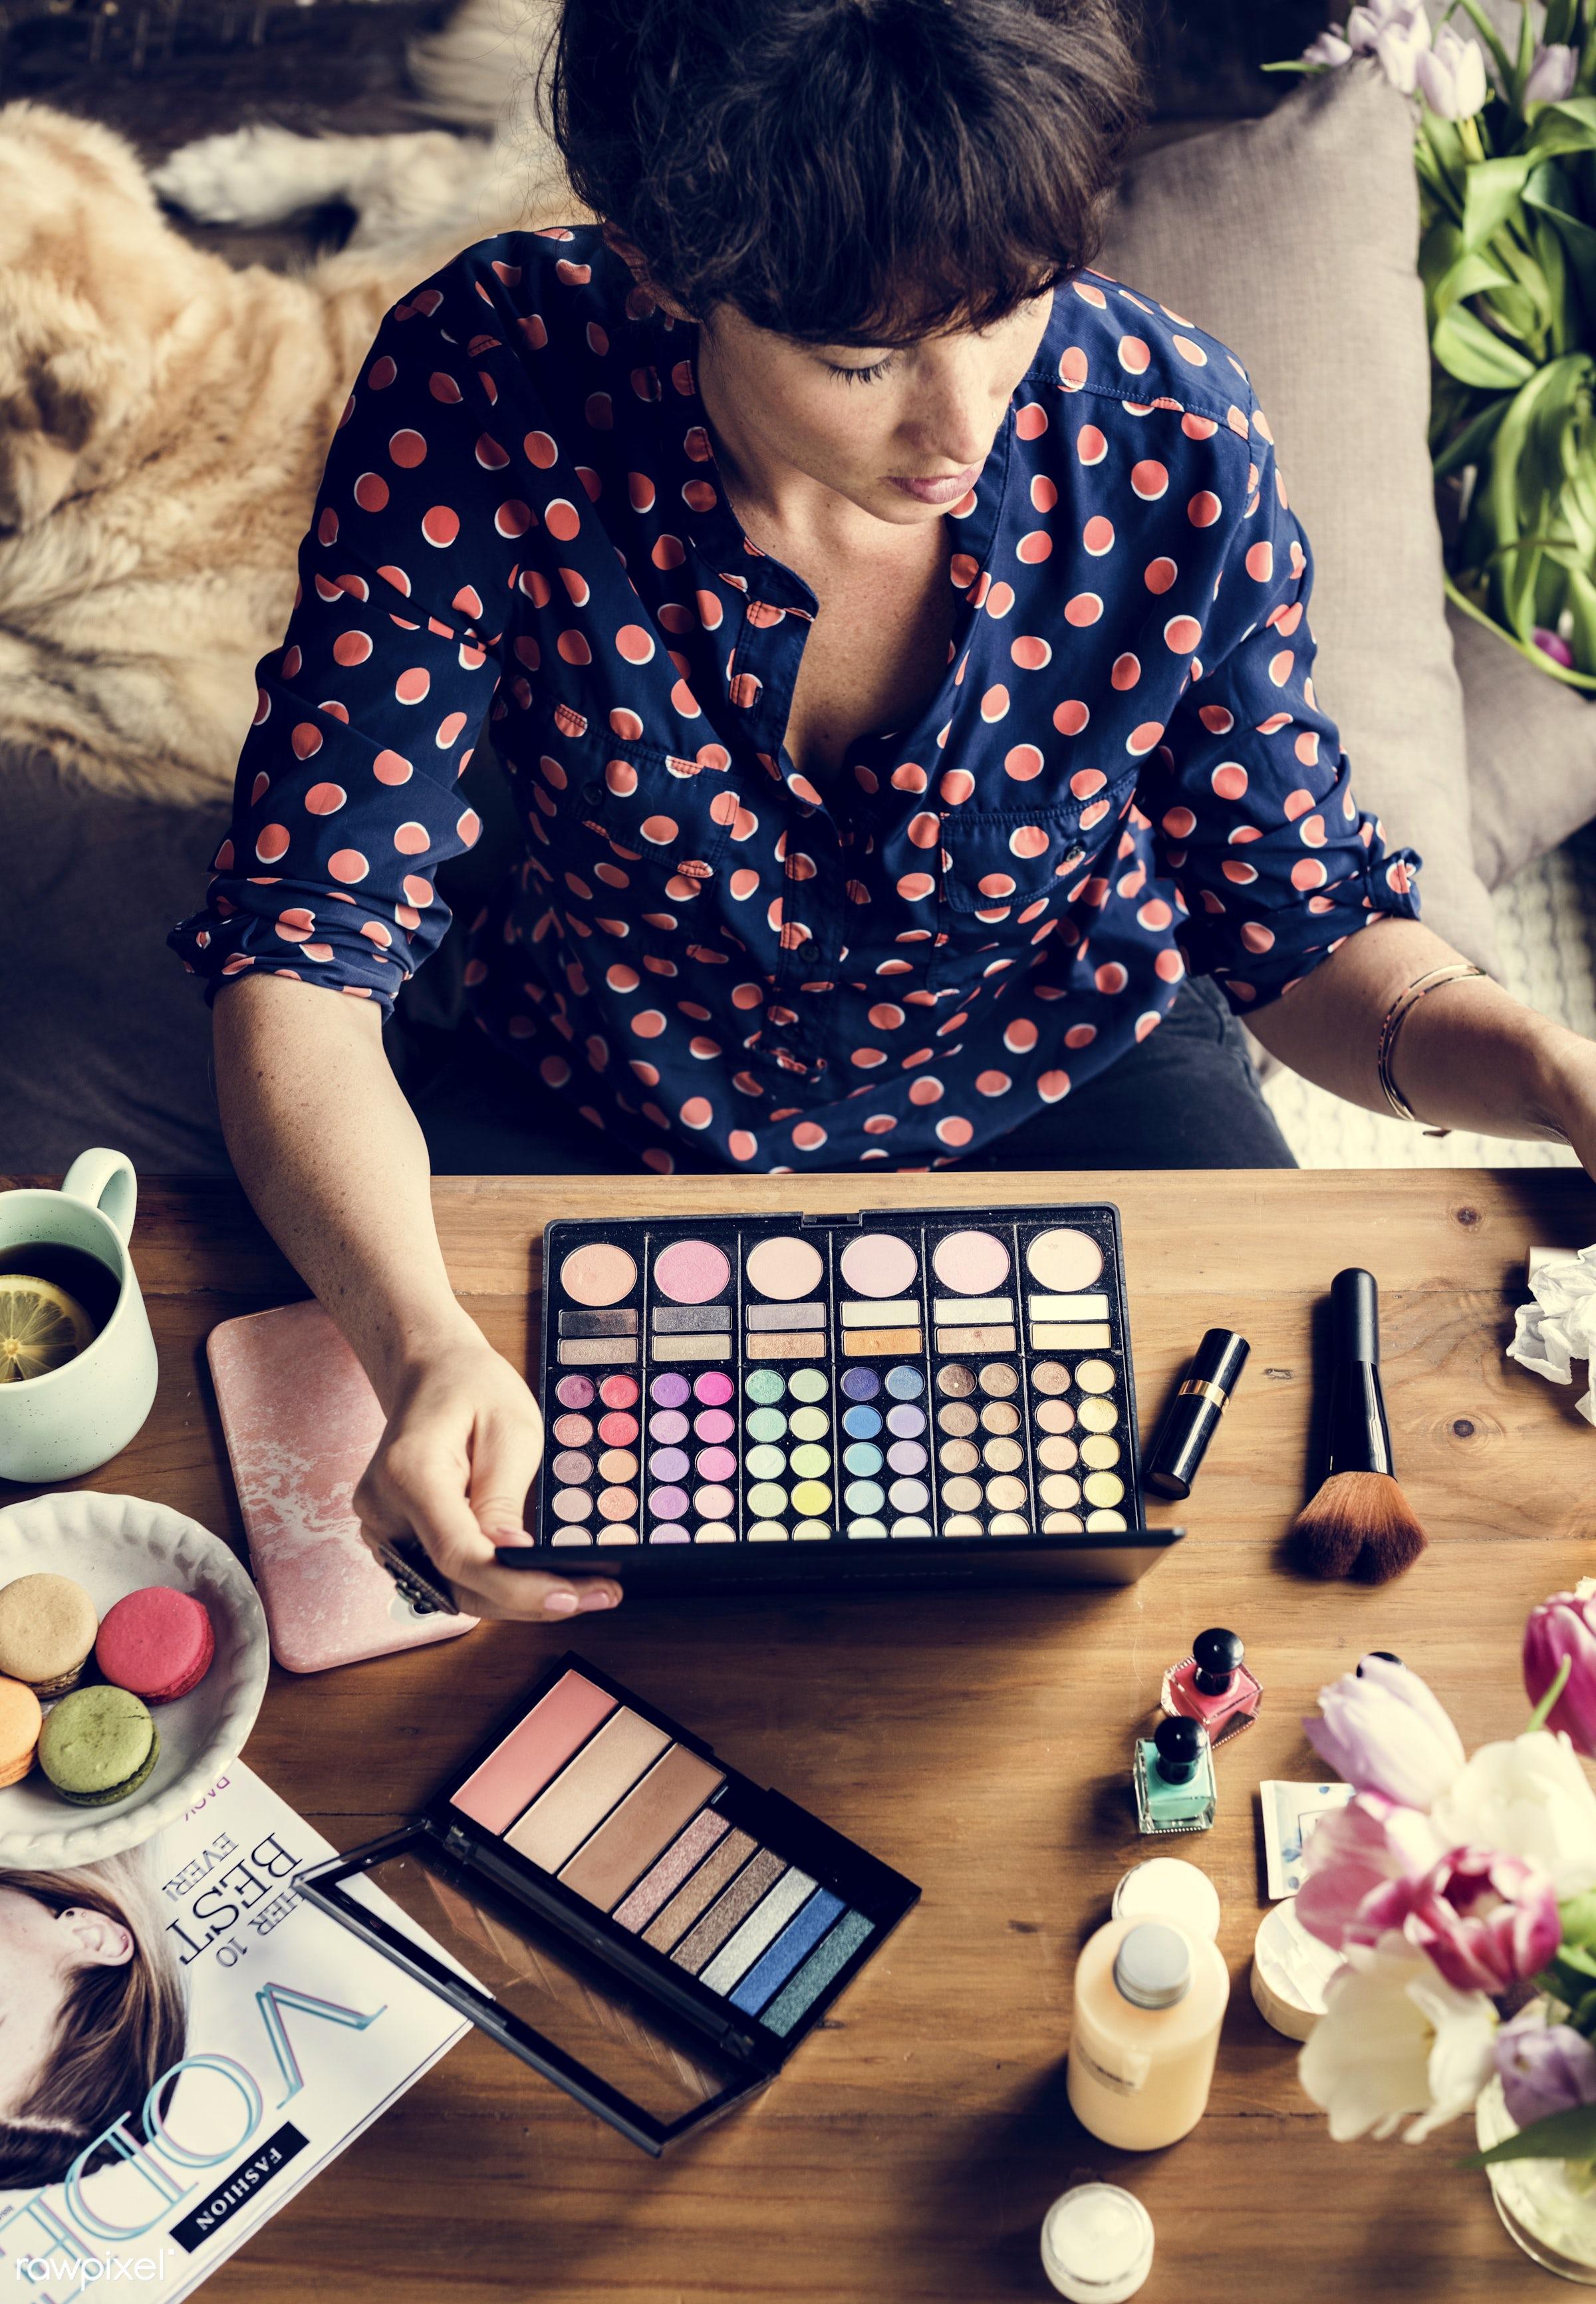 face, pastel, nail polish, glasses, makeup artist, colorful, makeup, set, treatment, powder, palette, blusher, beauty,...